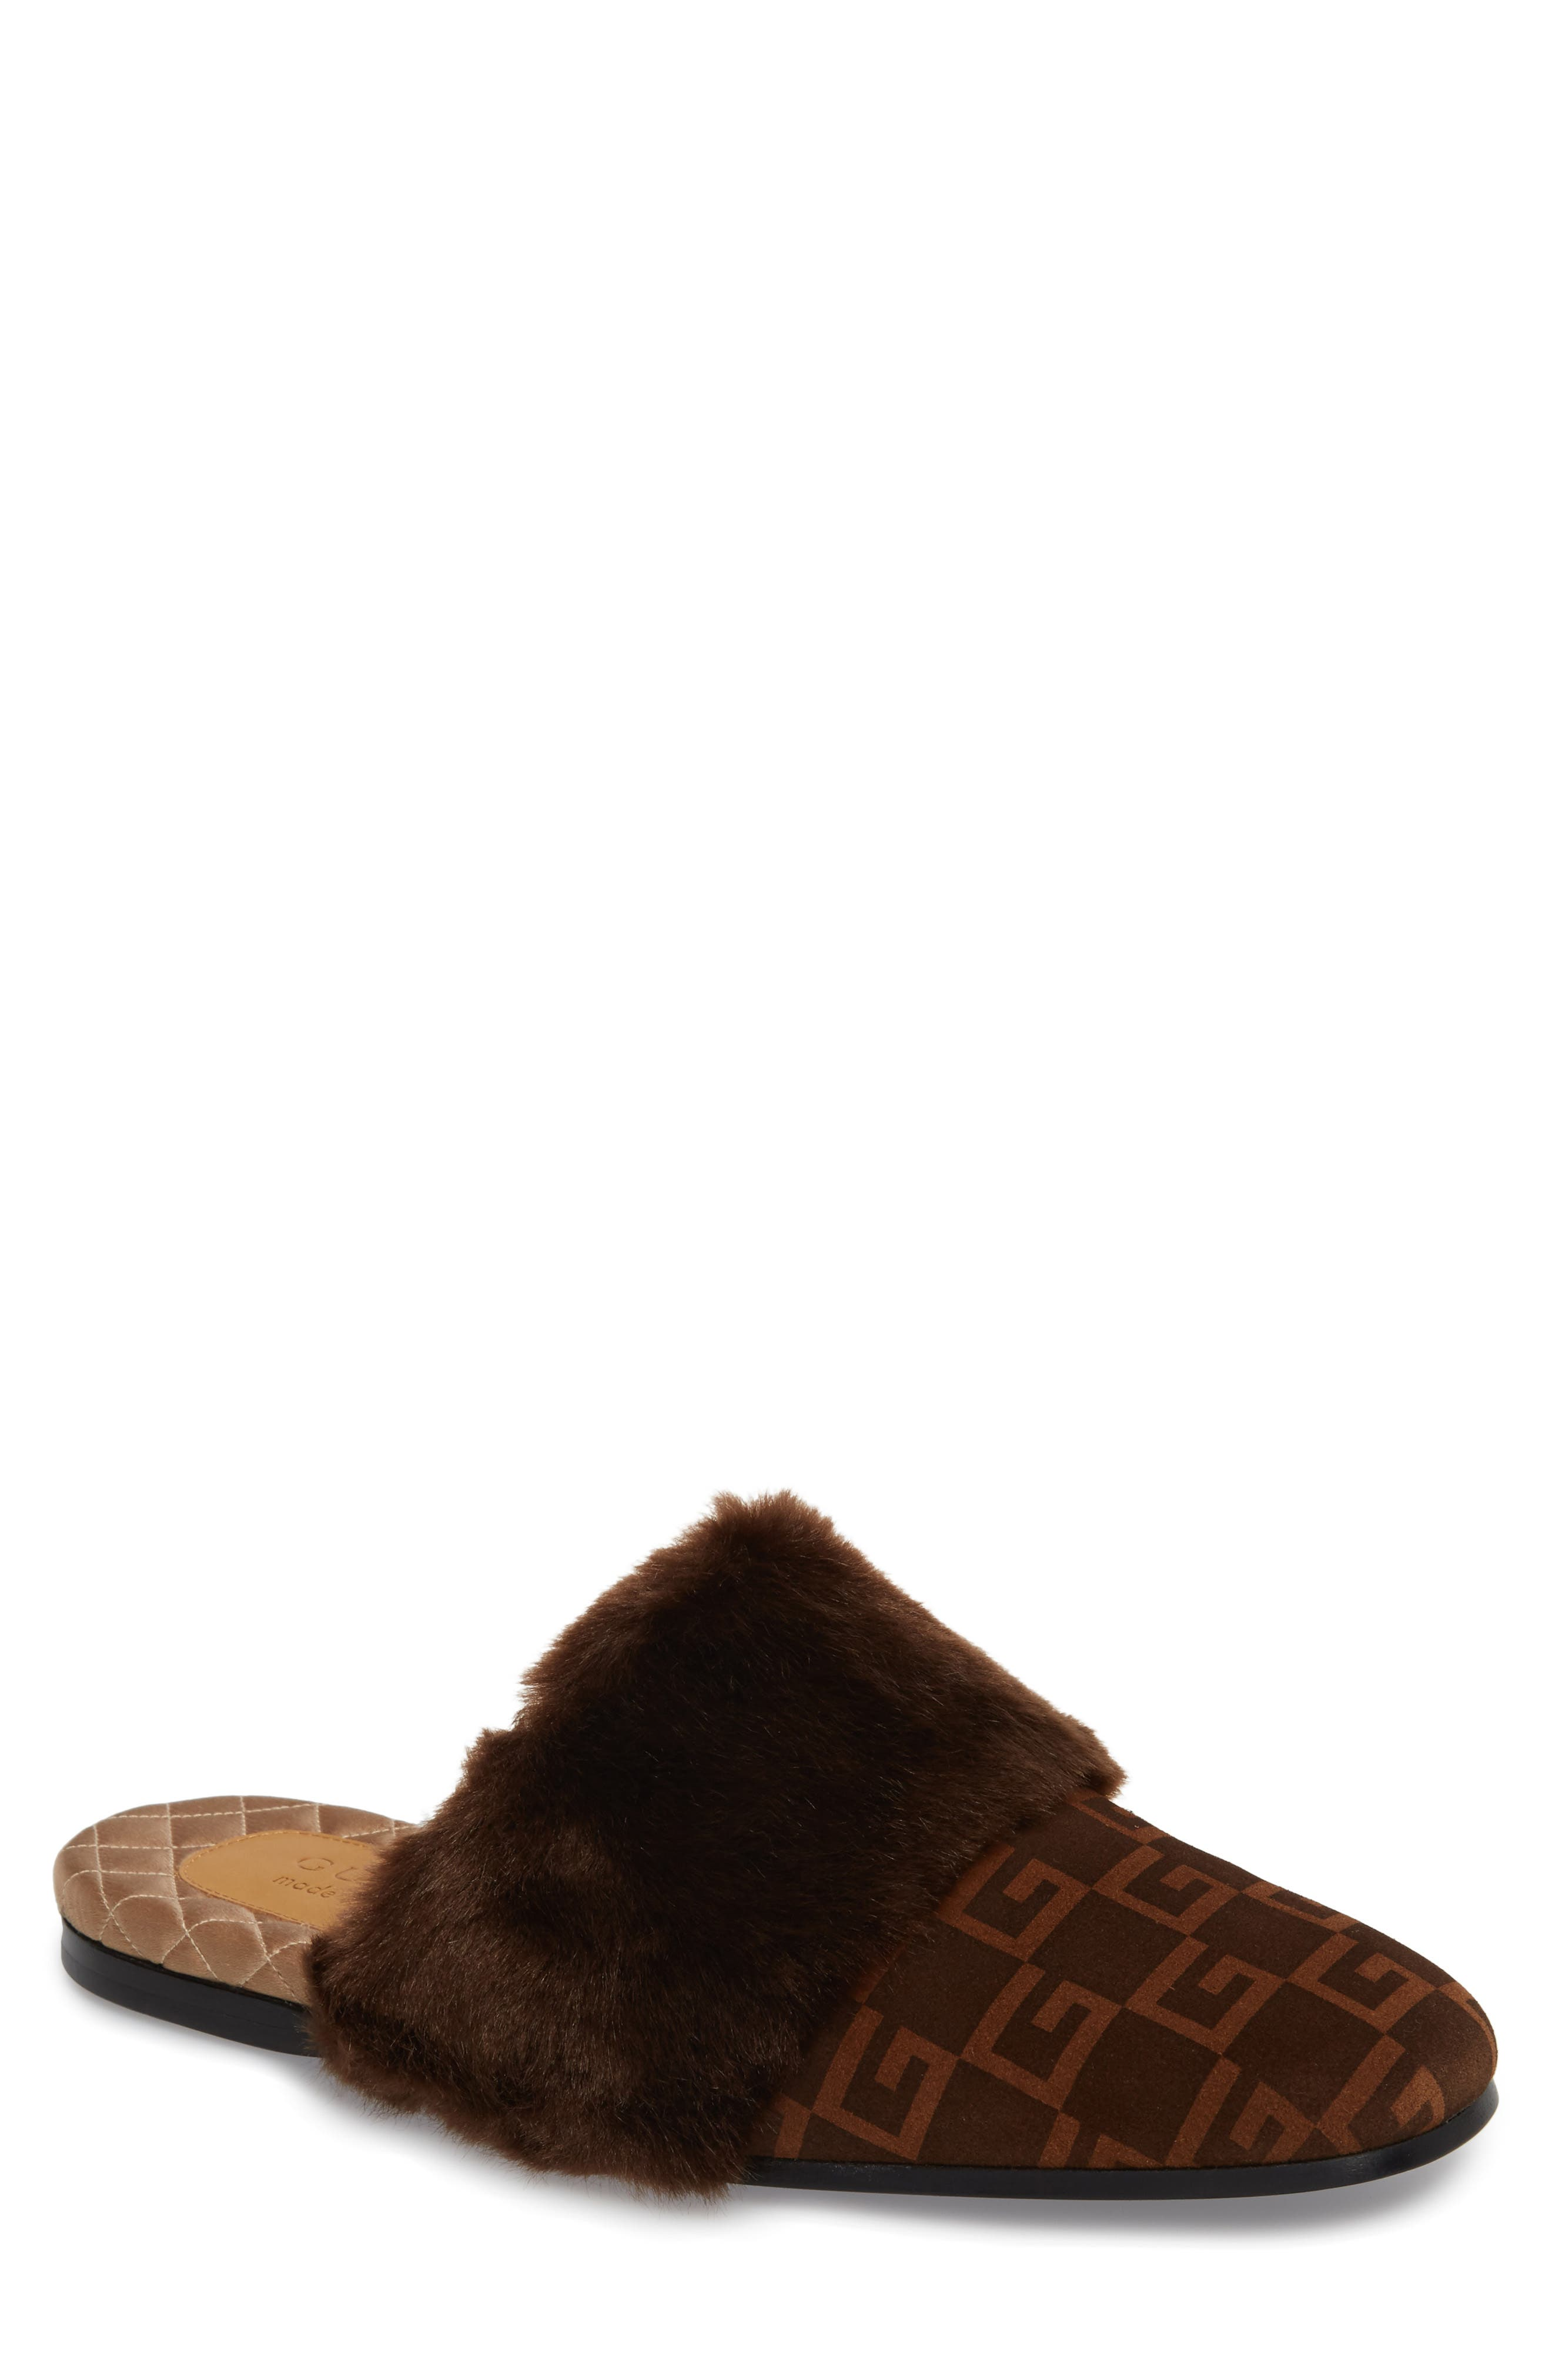 33cdb42ed Buy gucci slippers for men - Best men's gucci slippers shop - Cools.com